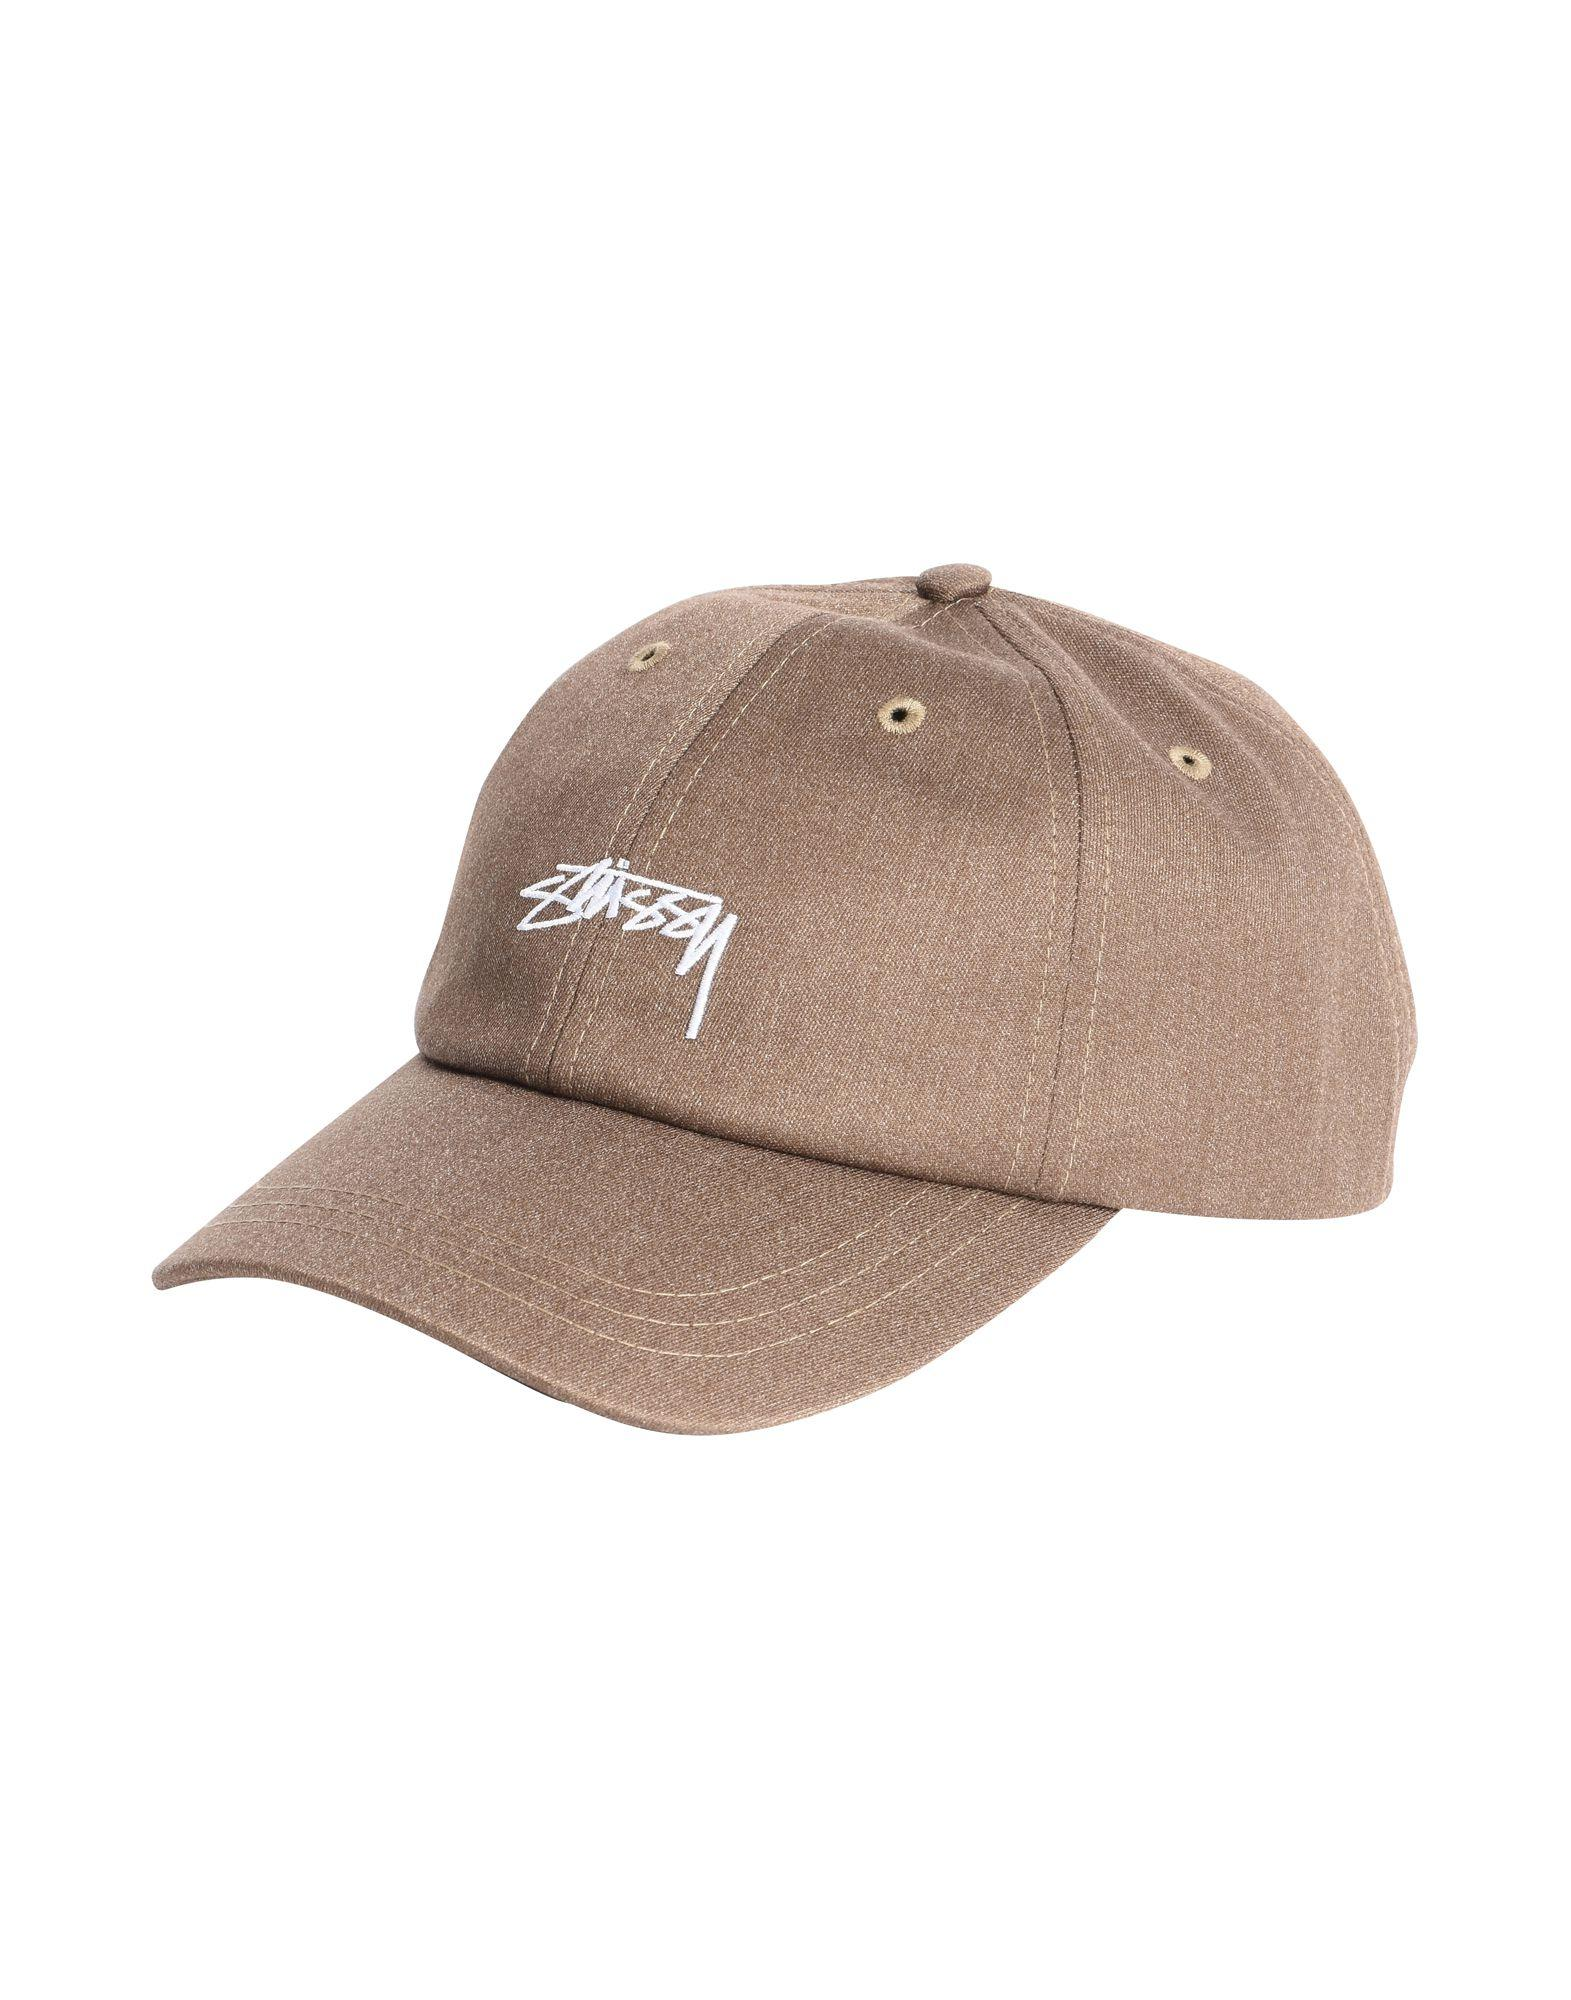 Stussy Hats In Khaki